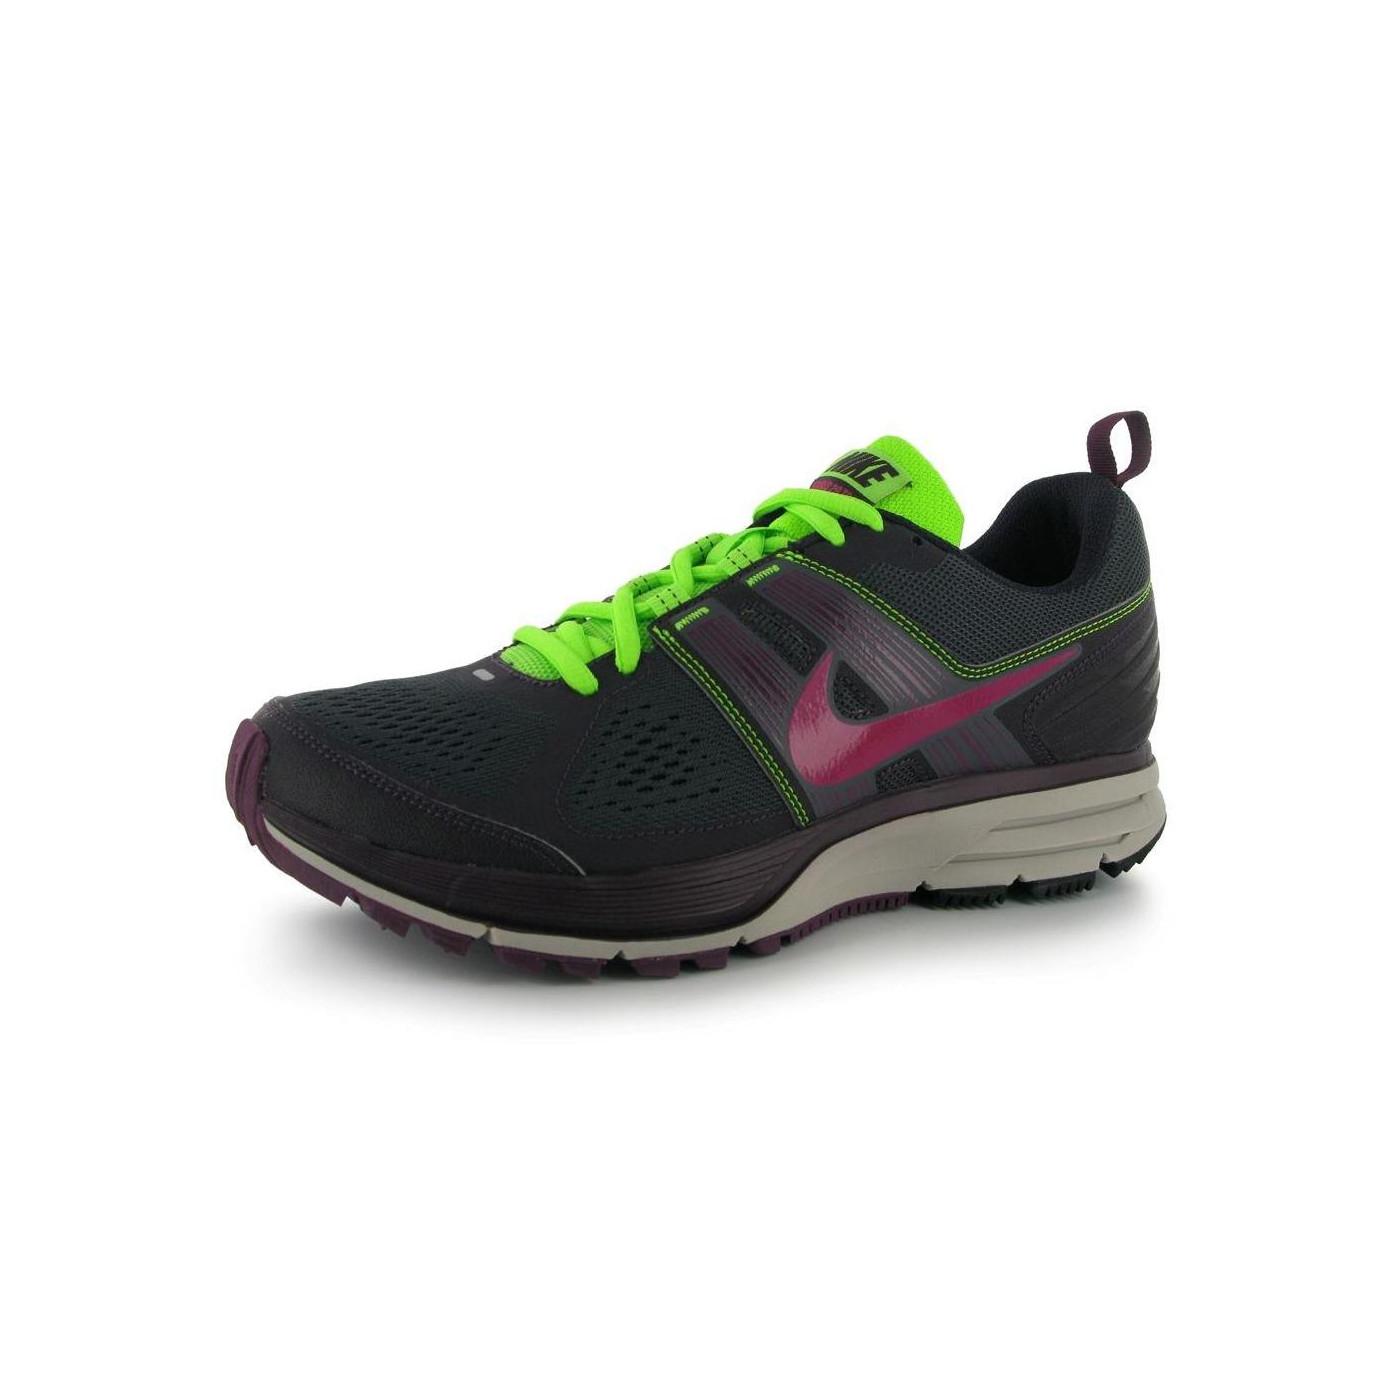 ab7c3a46280 Nike Pegasus Plus Trail Ladies Running Shoes - FACTCOOL